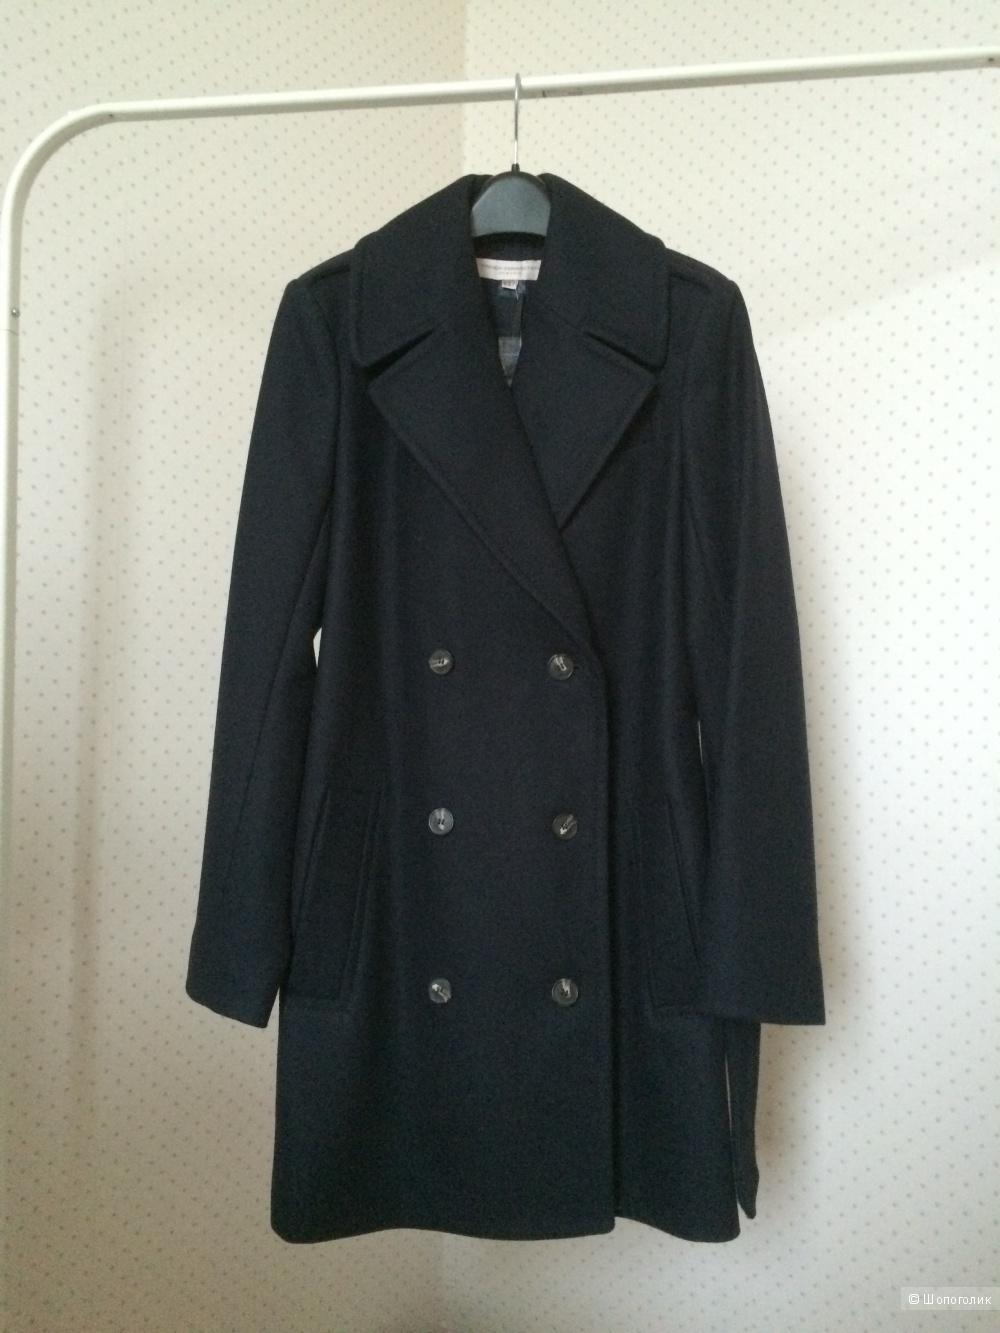 Новое шестяное пальто French Connection, росс. размер 44